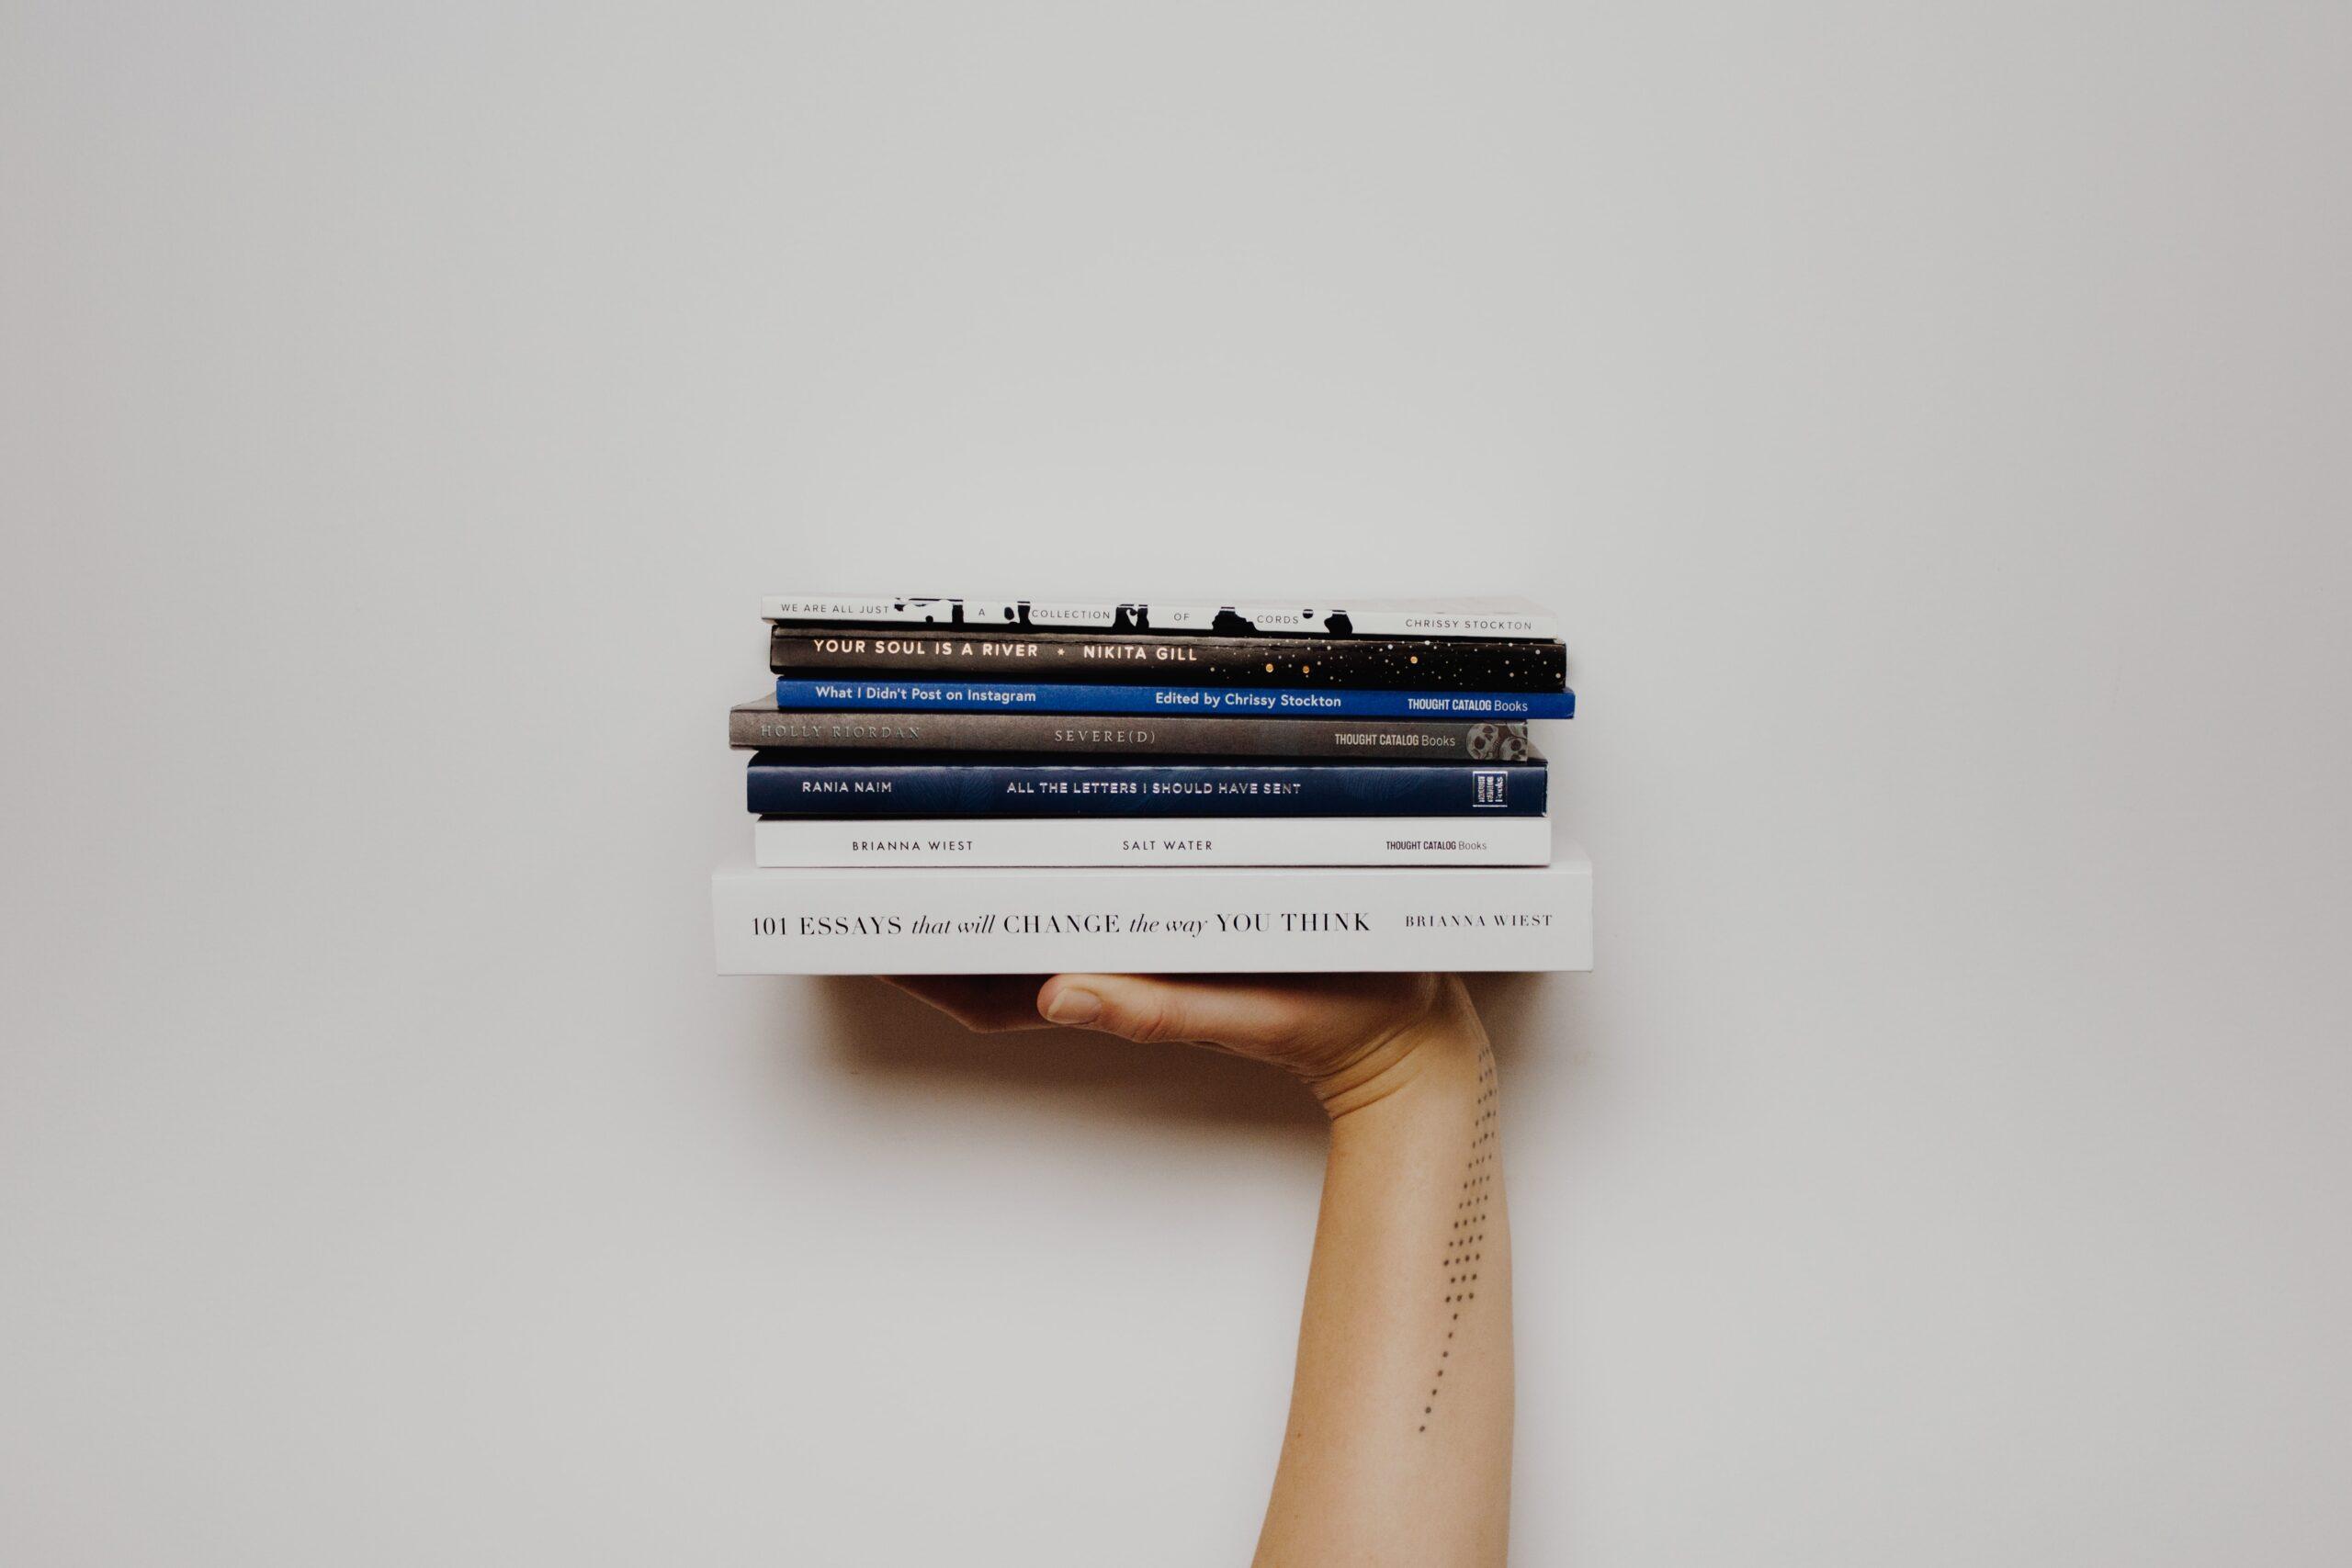 Alcune letture dell'outlet libri Amazon sotto i 7 euro thumbnail